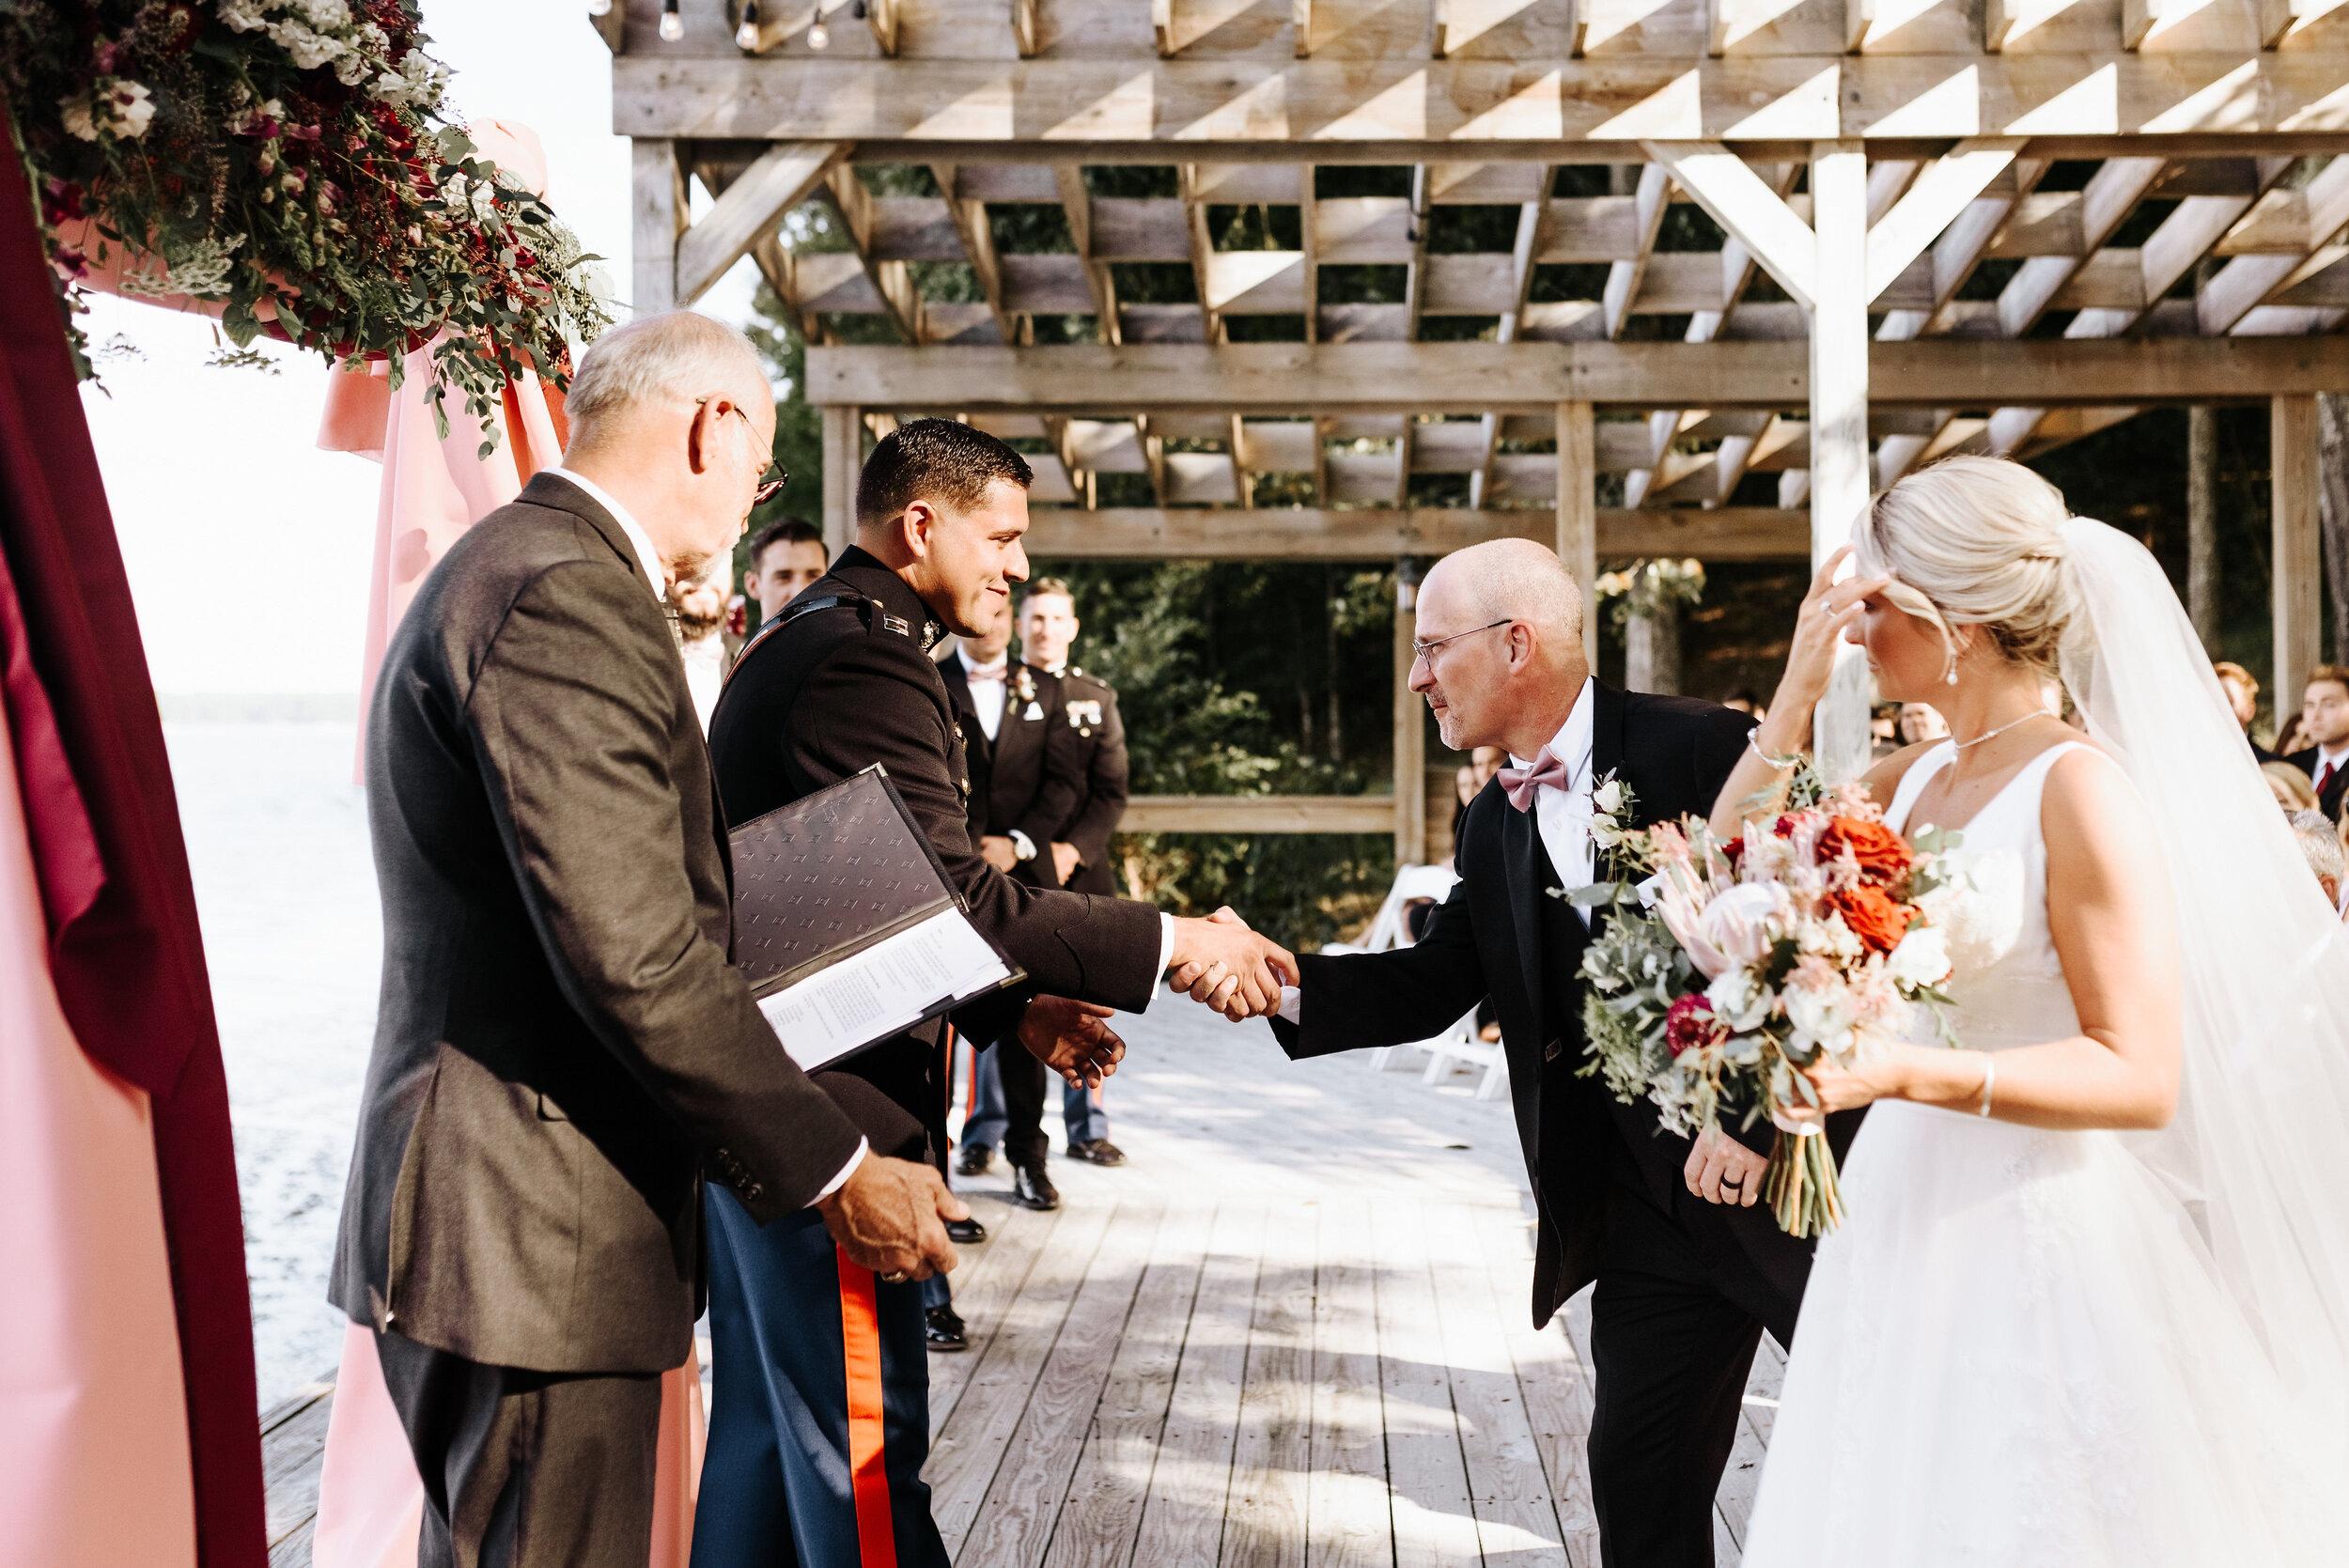 Emily_Mike_Wedding_Celebrations_at_the_Reservoir_Pool_Pavilion_Richmond_Virginia_Wedding_Photographer_Photography_by_V_45.jpg